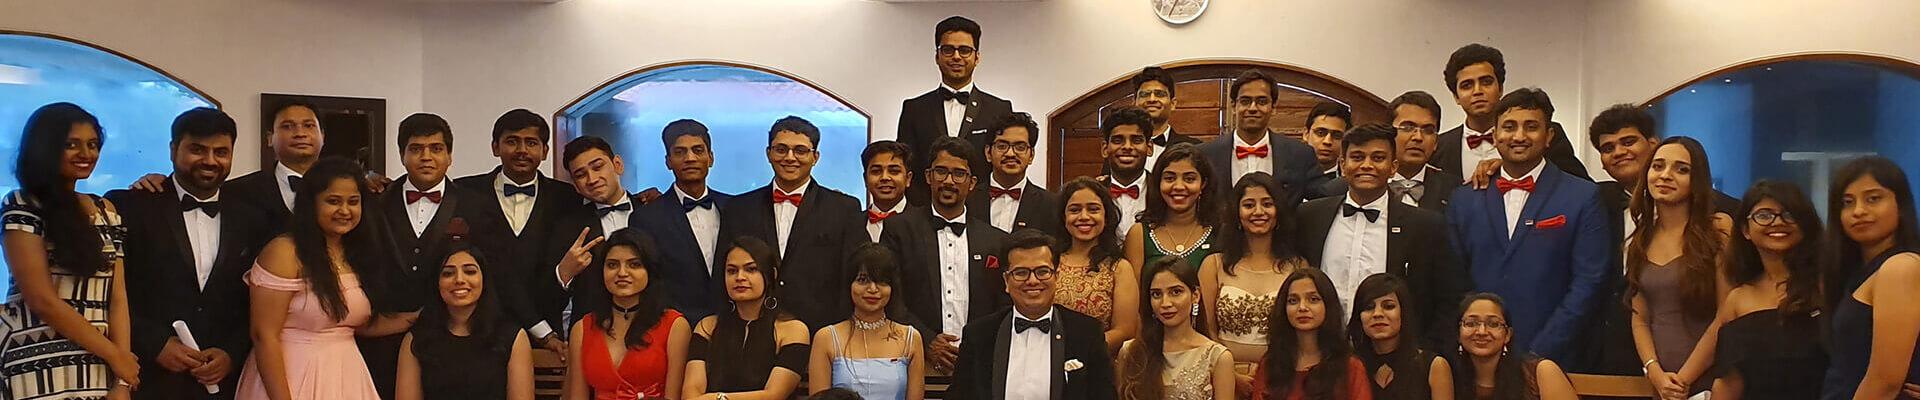 MBA in India Athena